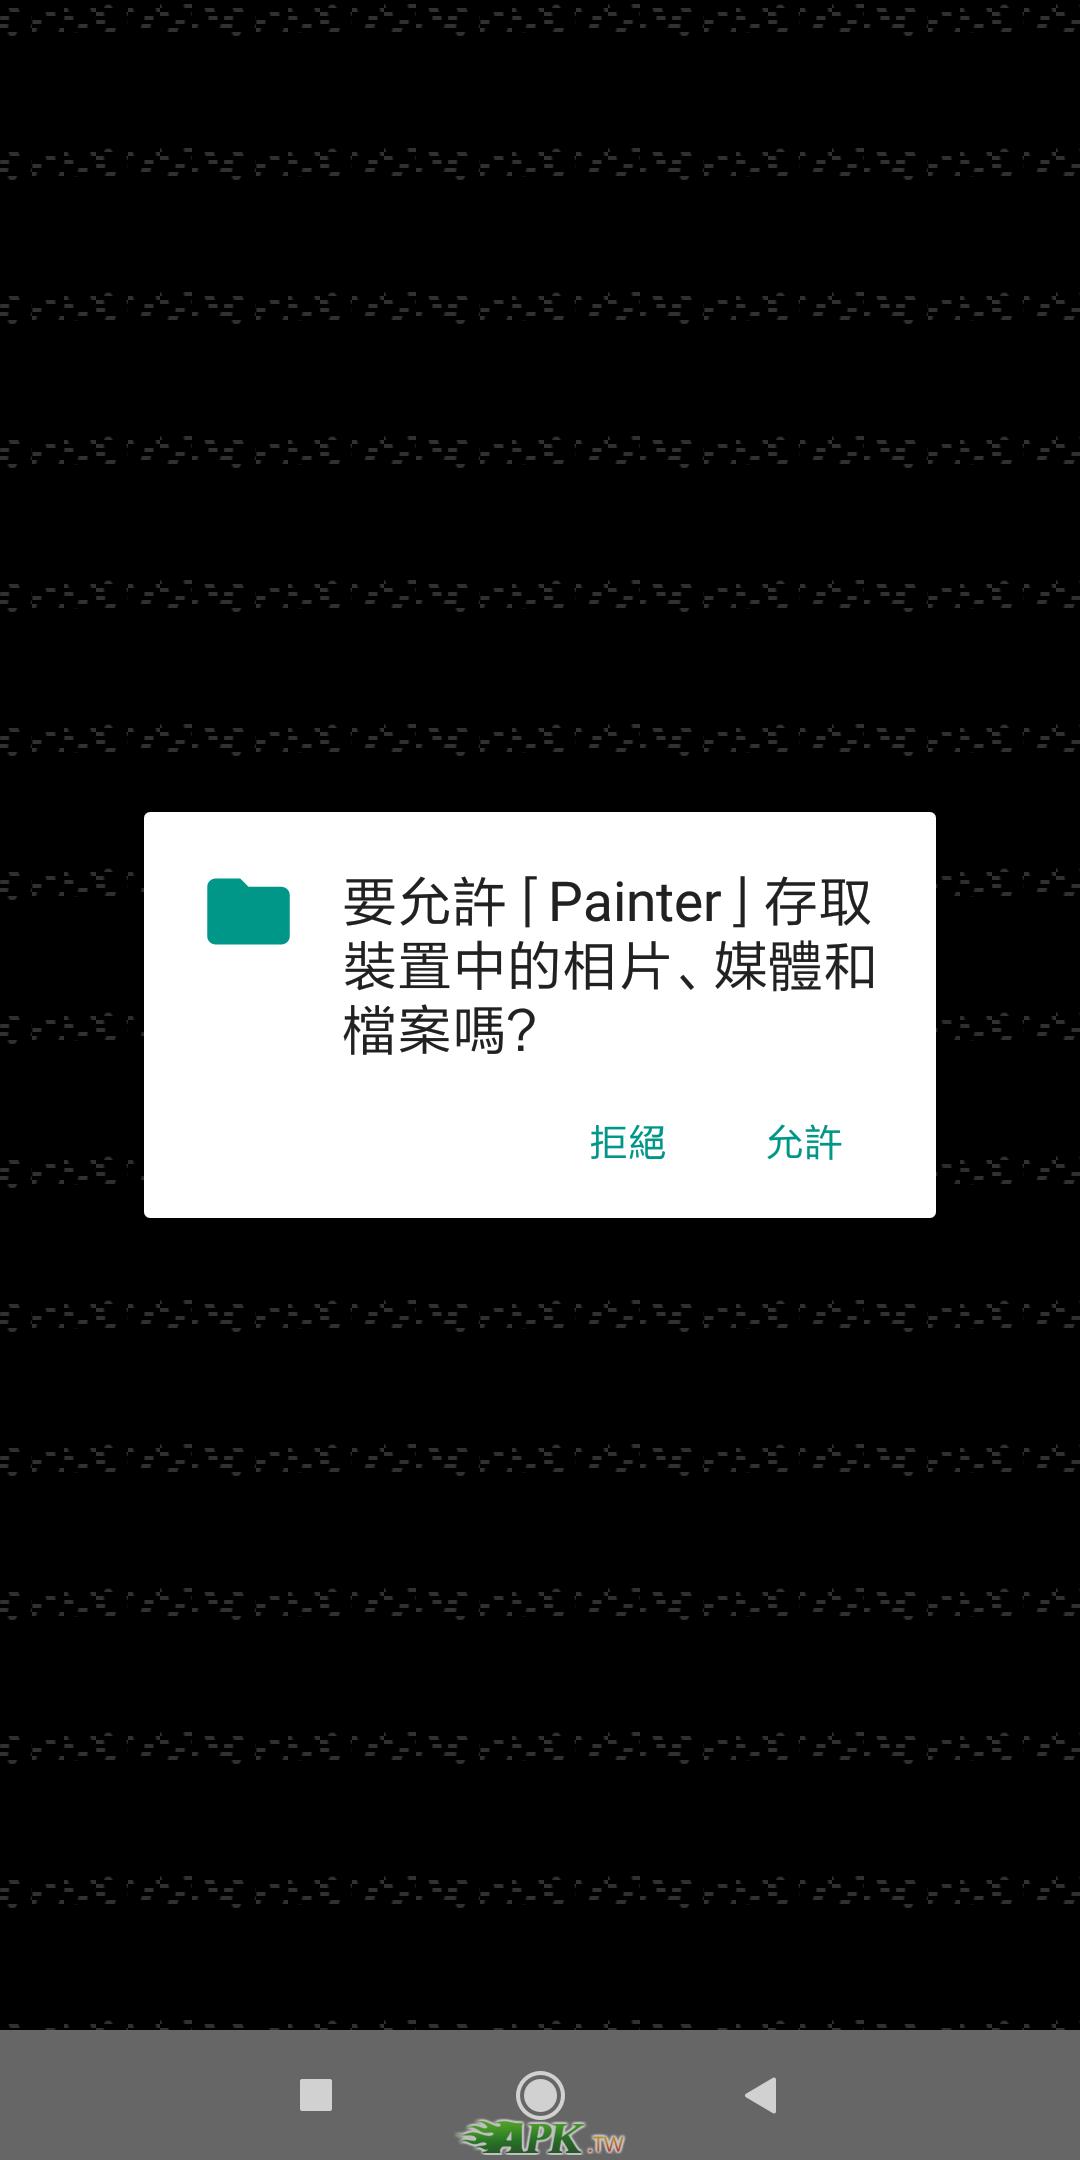 QQ图片20191112141402.png